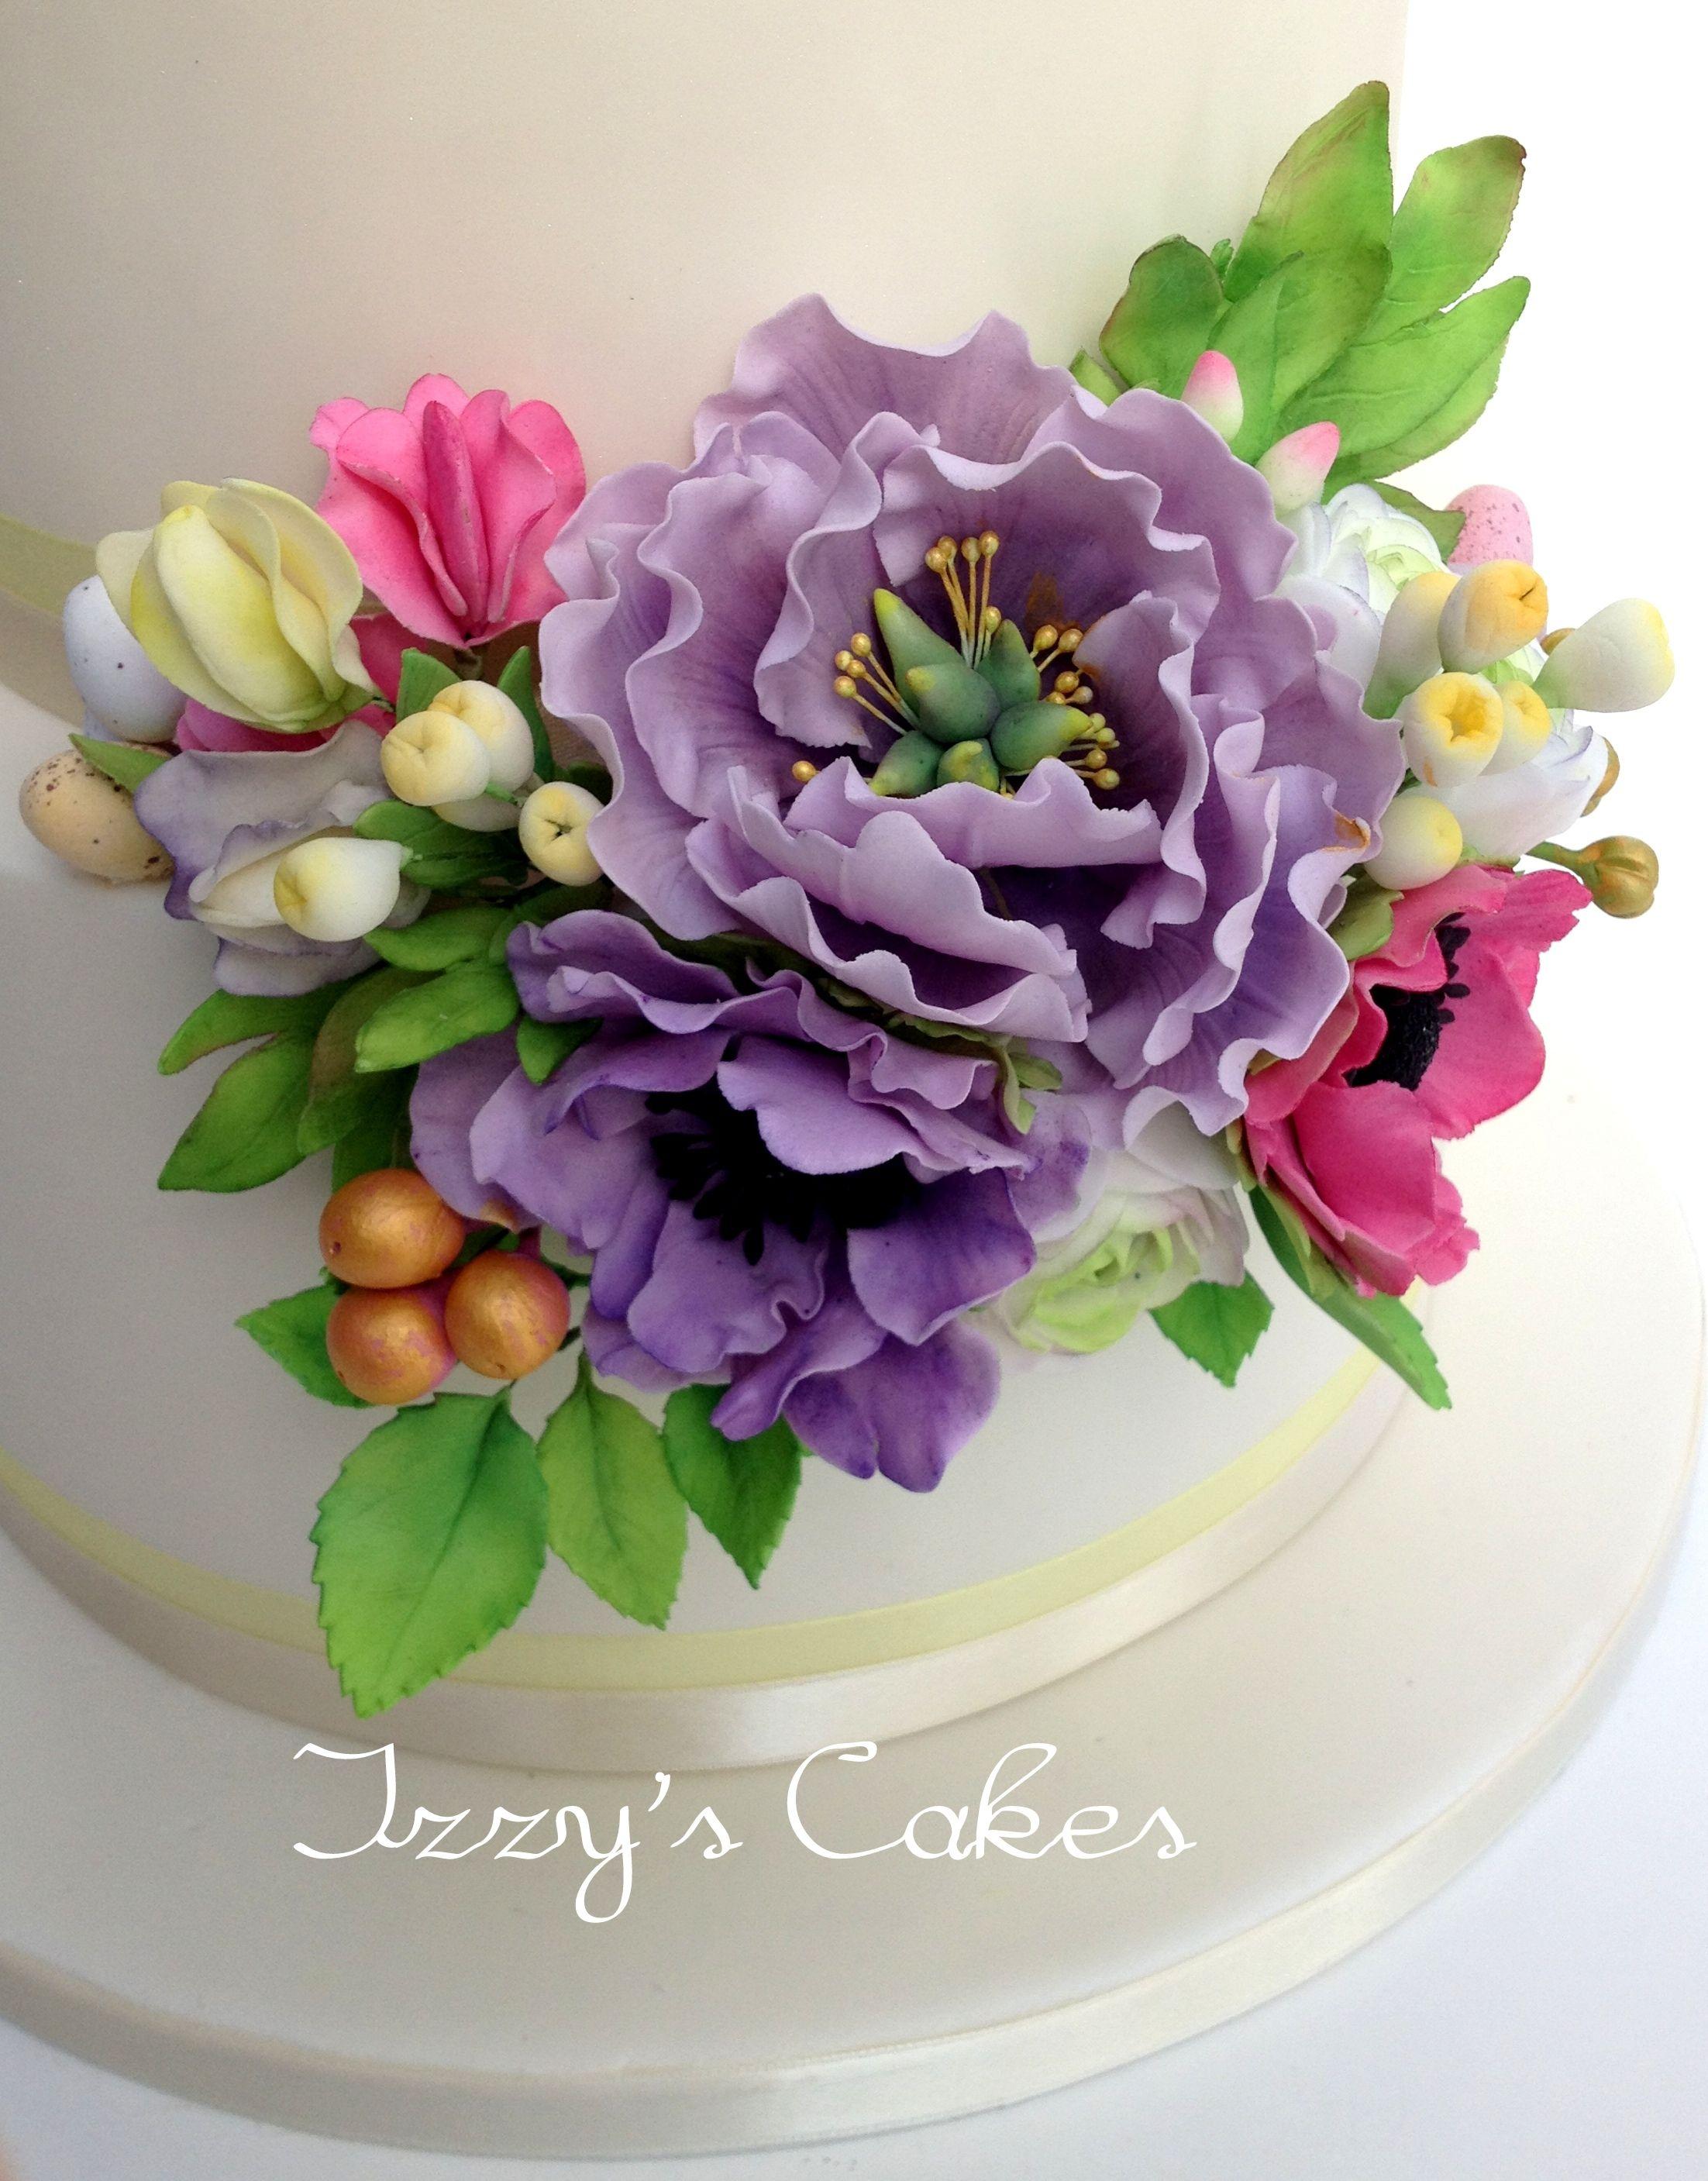 Edible Sugar Flowers Peony Anemone Sweet Pea To Match The